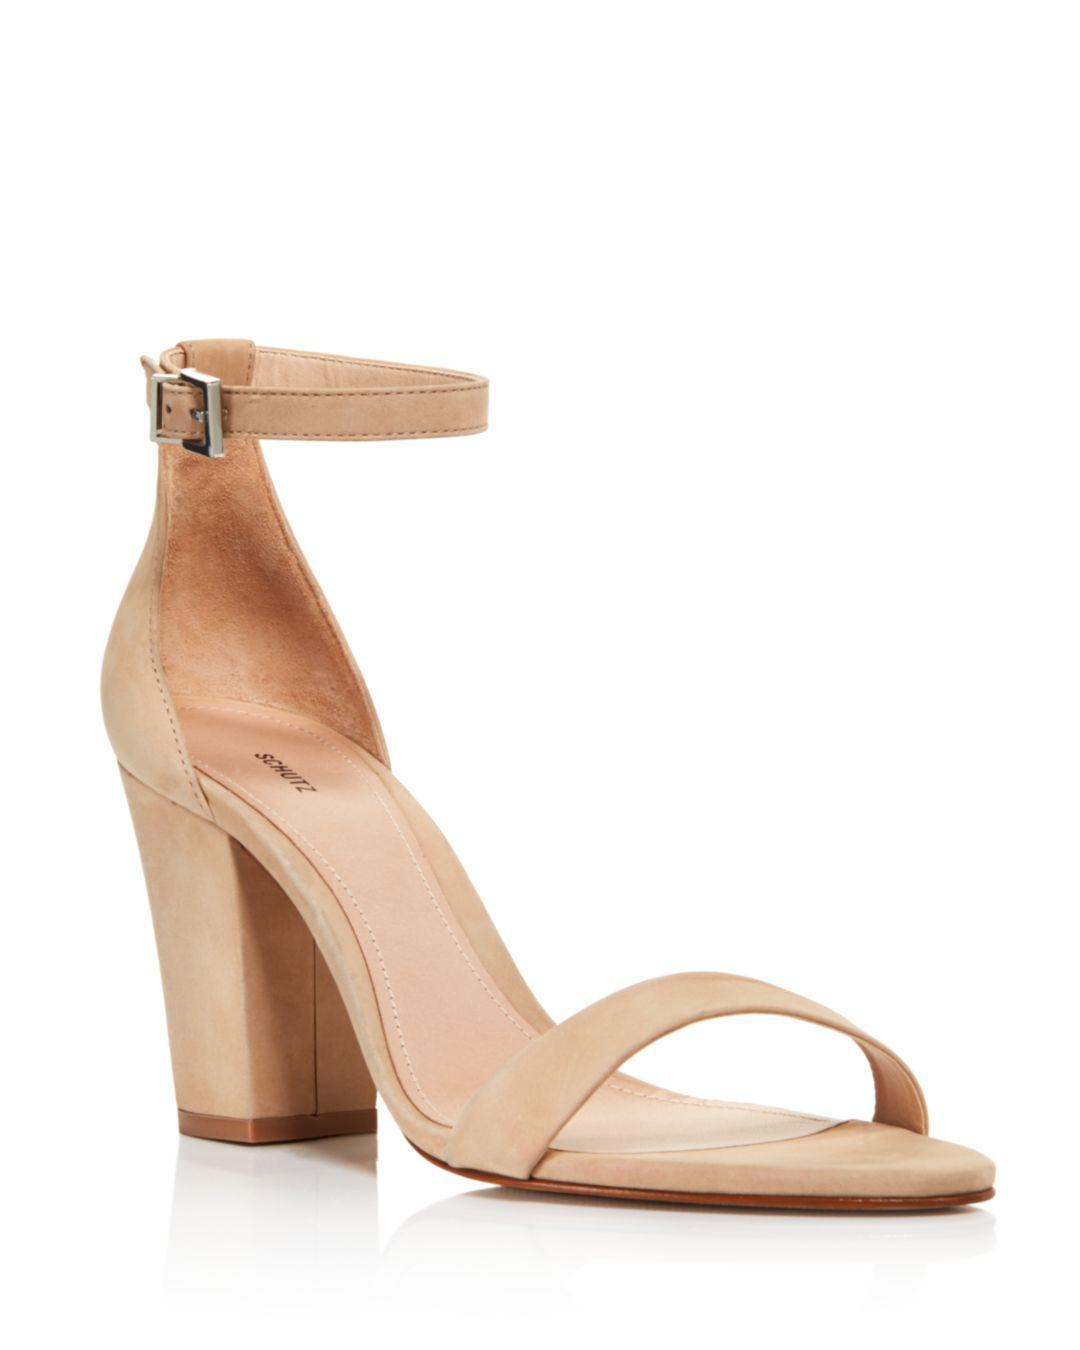 45ff08e0f5cd Schutz Women s Enida Suede Ankle Strap Block-heel Sandals in Natural ...